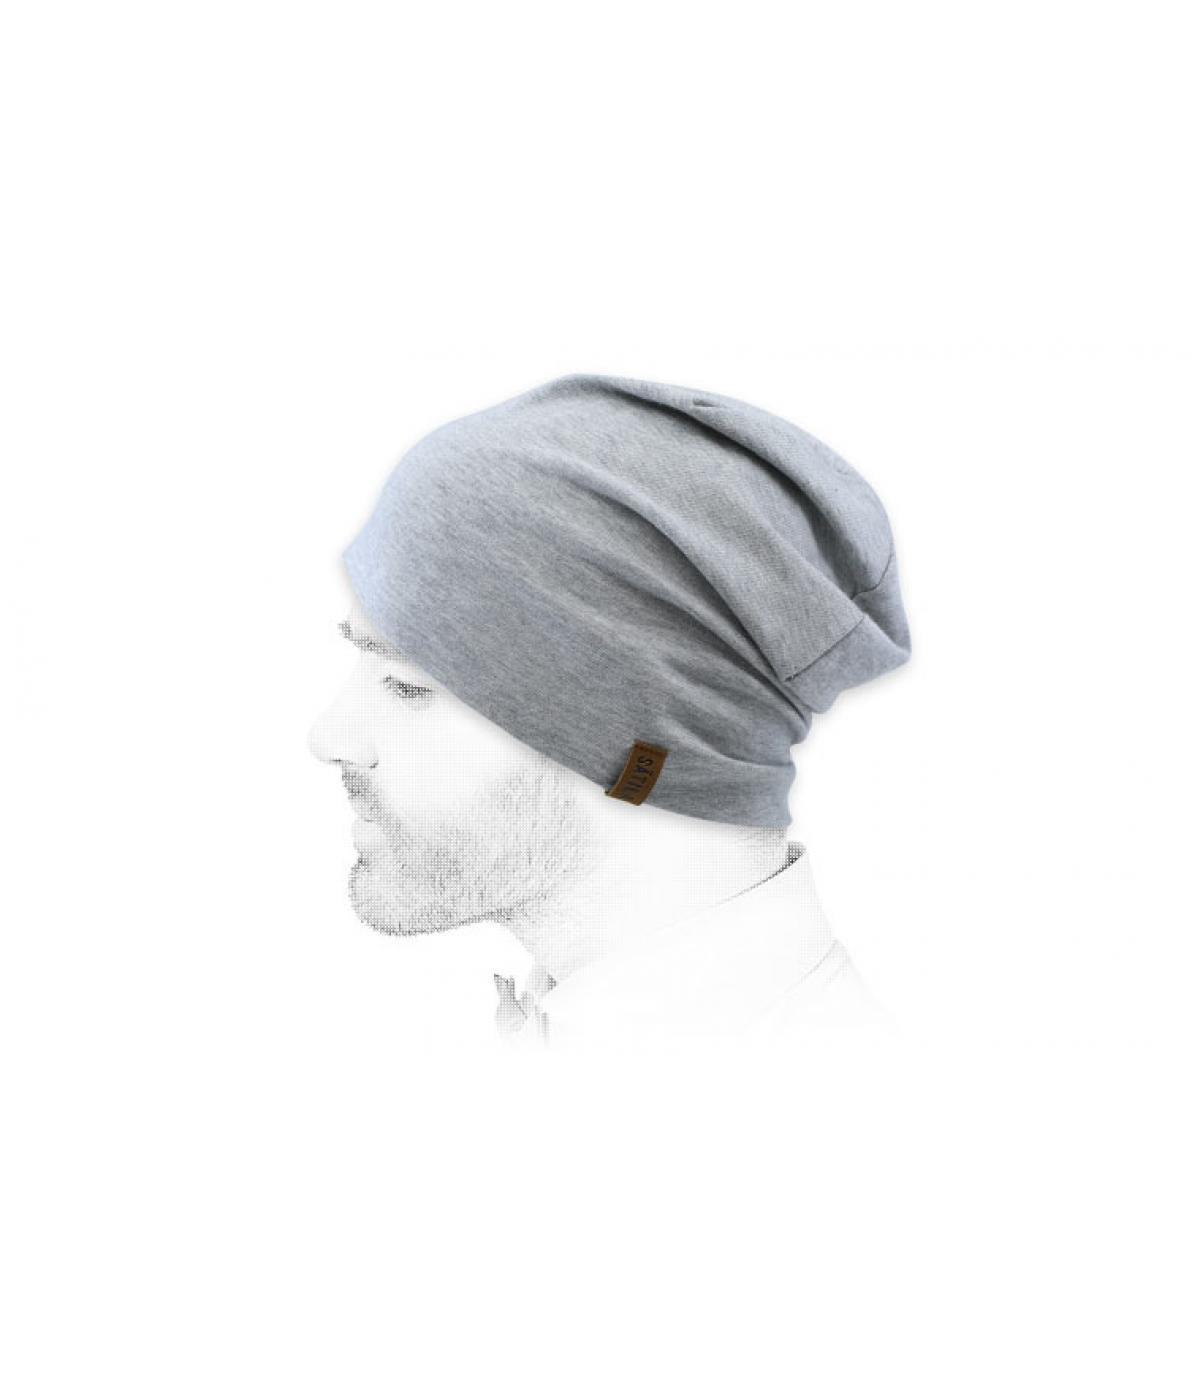 cappello lungo grigio